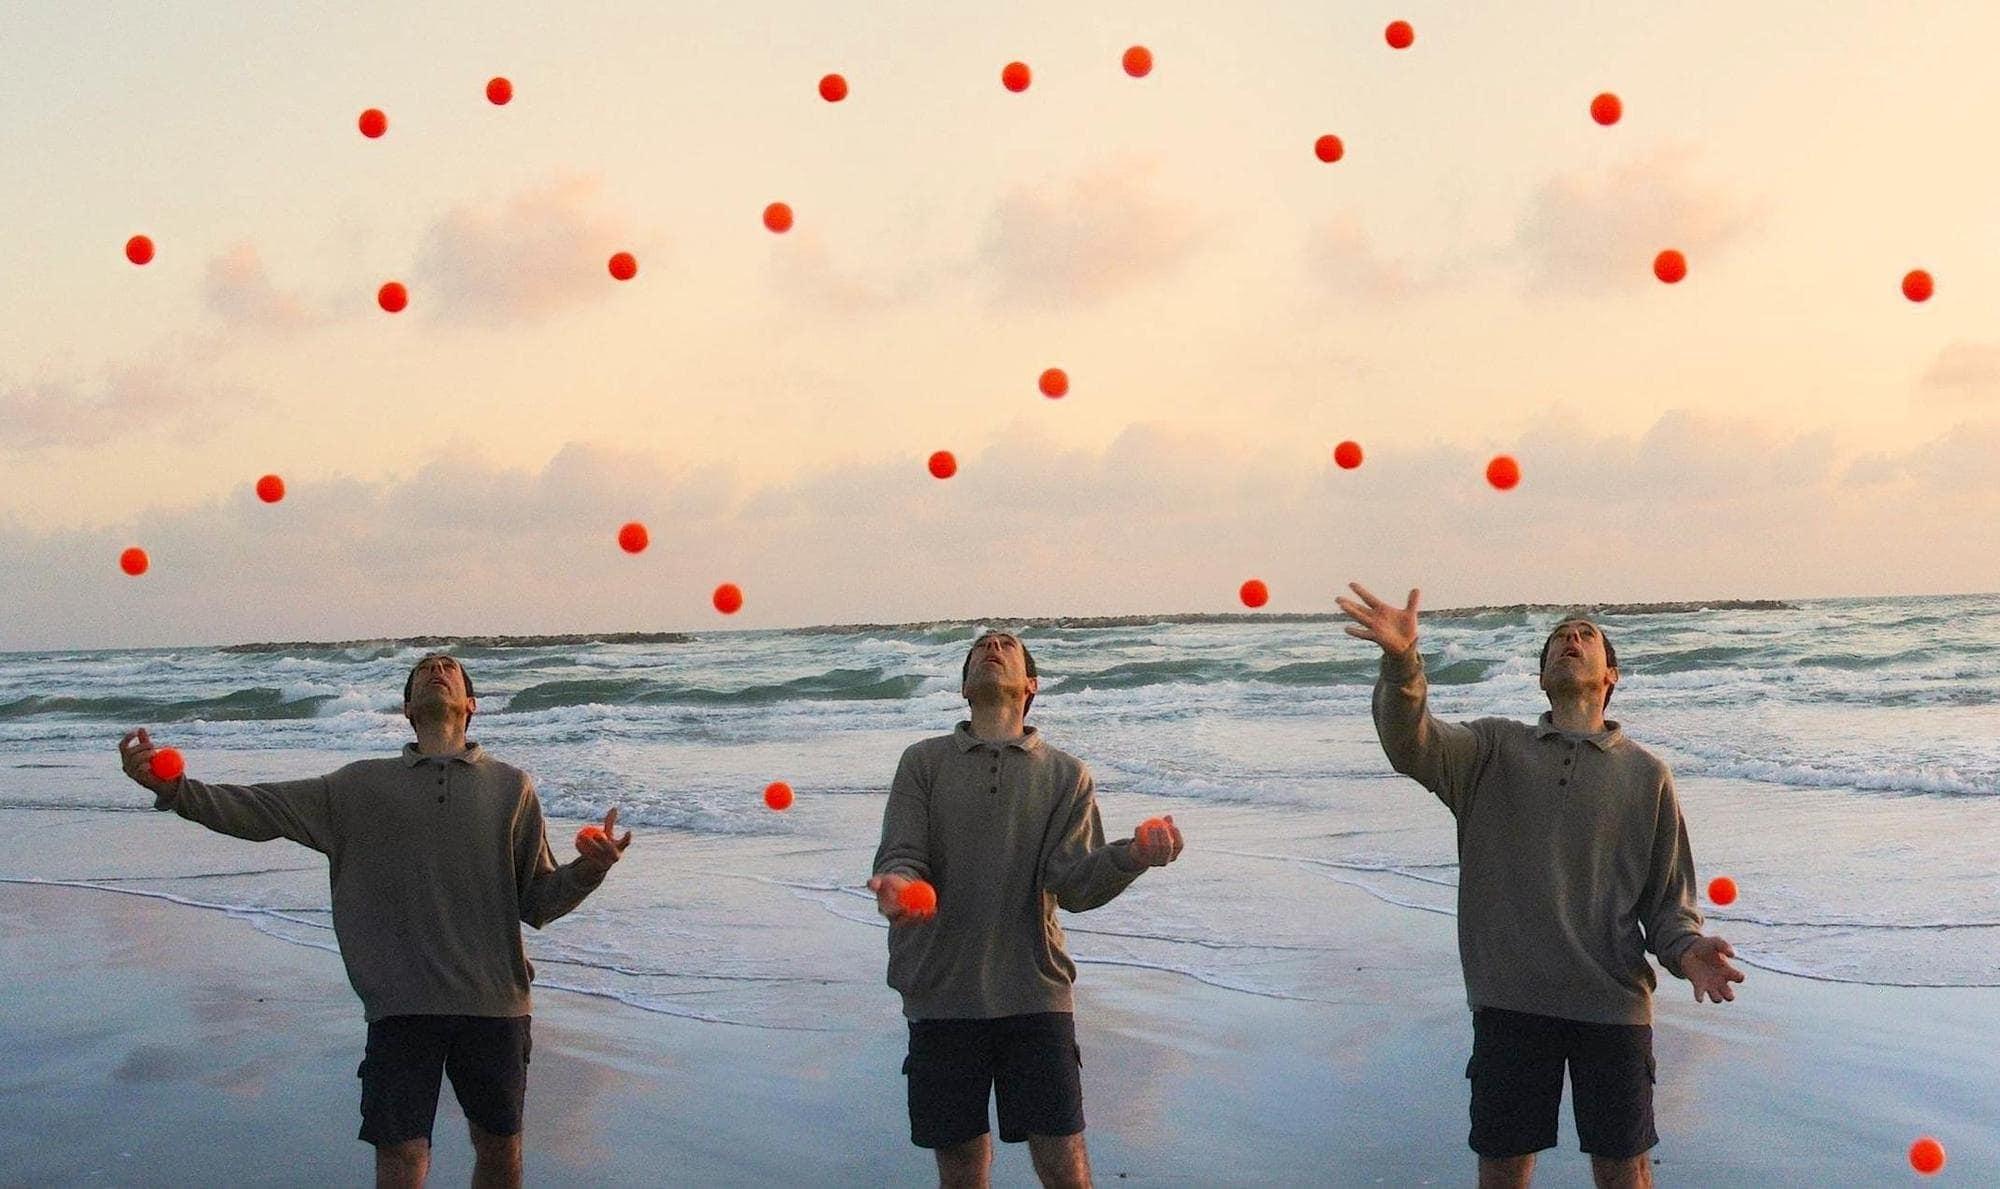 juggle dream meaning, dream about juggle, juggle dream interpretation, seeing in a dream juggle